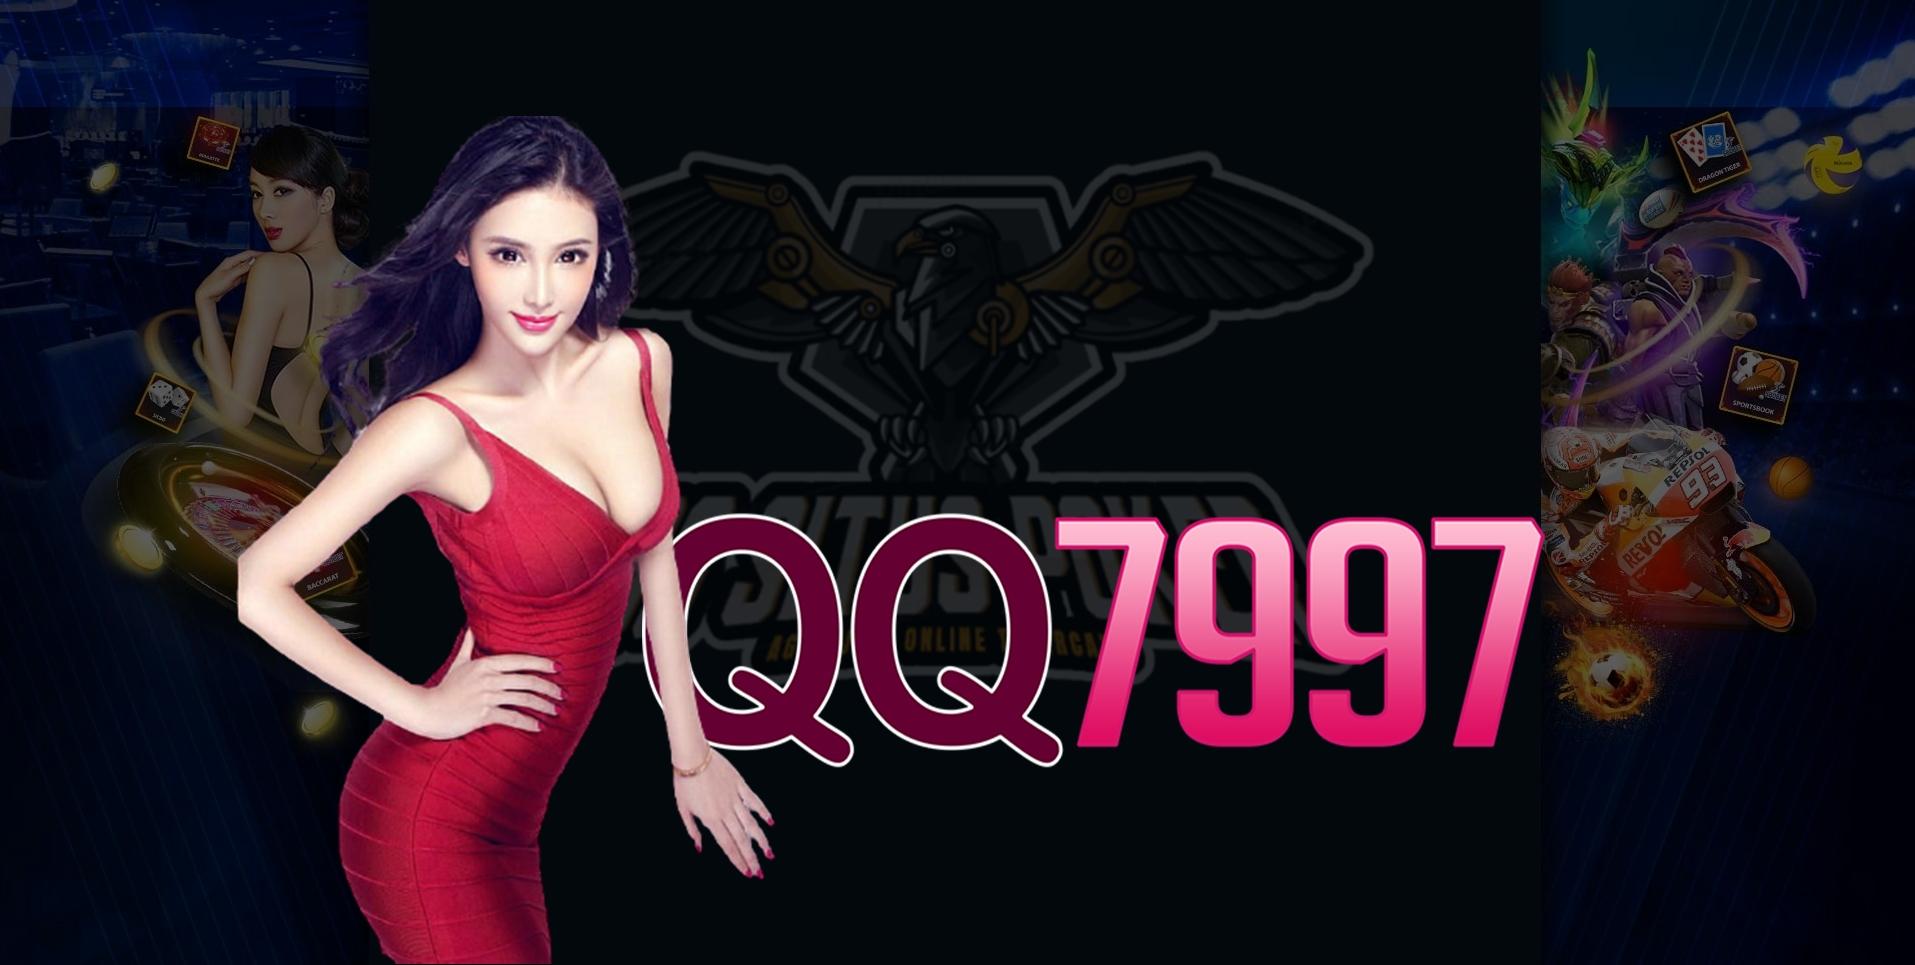 Situs Judi Online, Bandar Judi Bola, Slot Online Indonesia - QQ7997